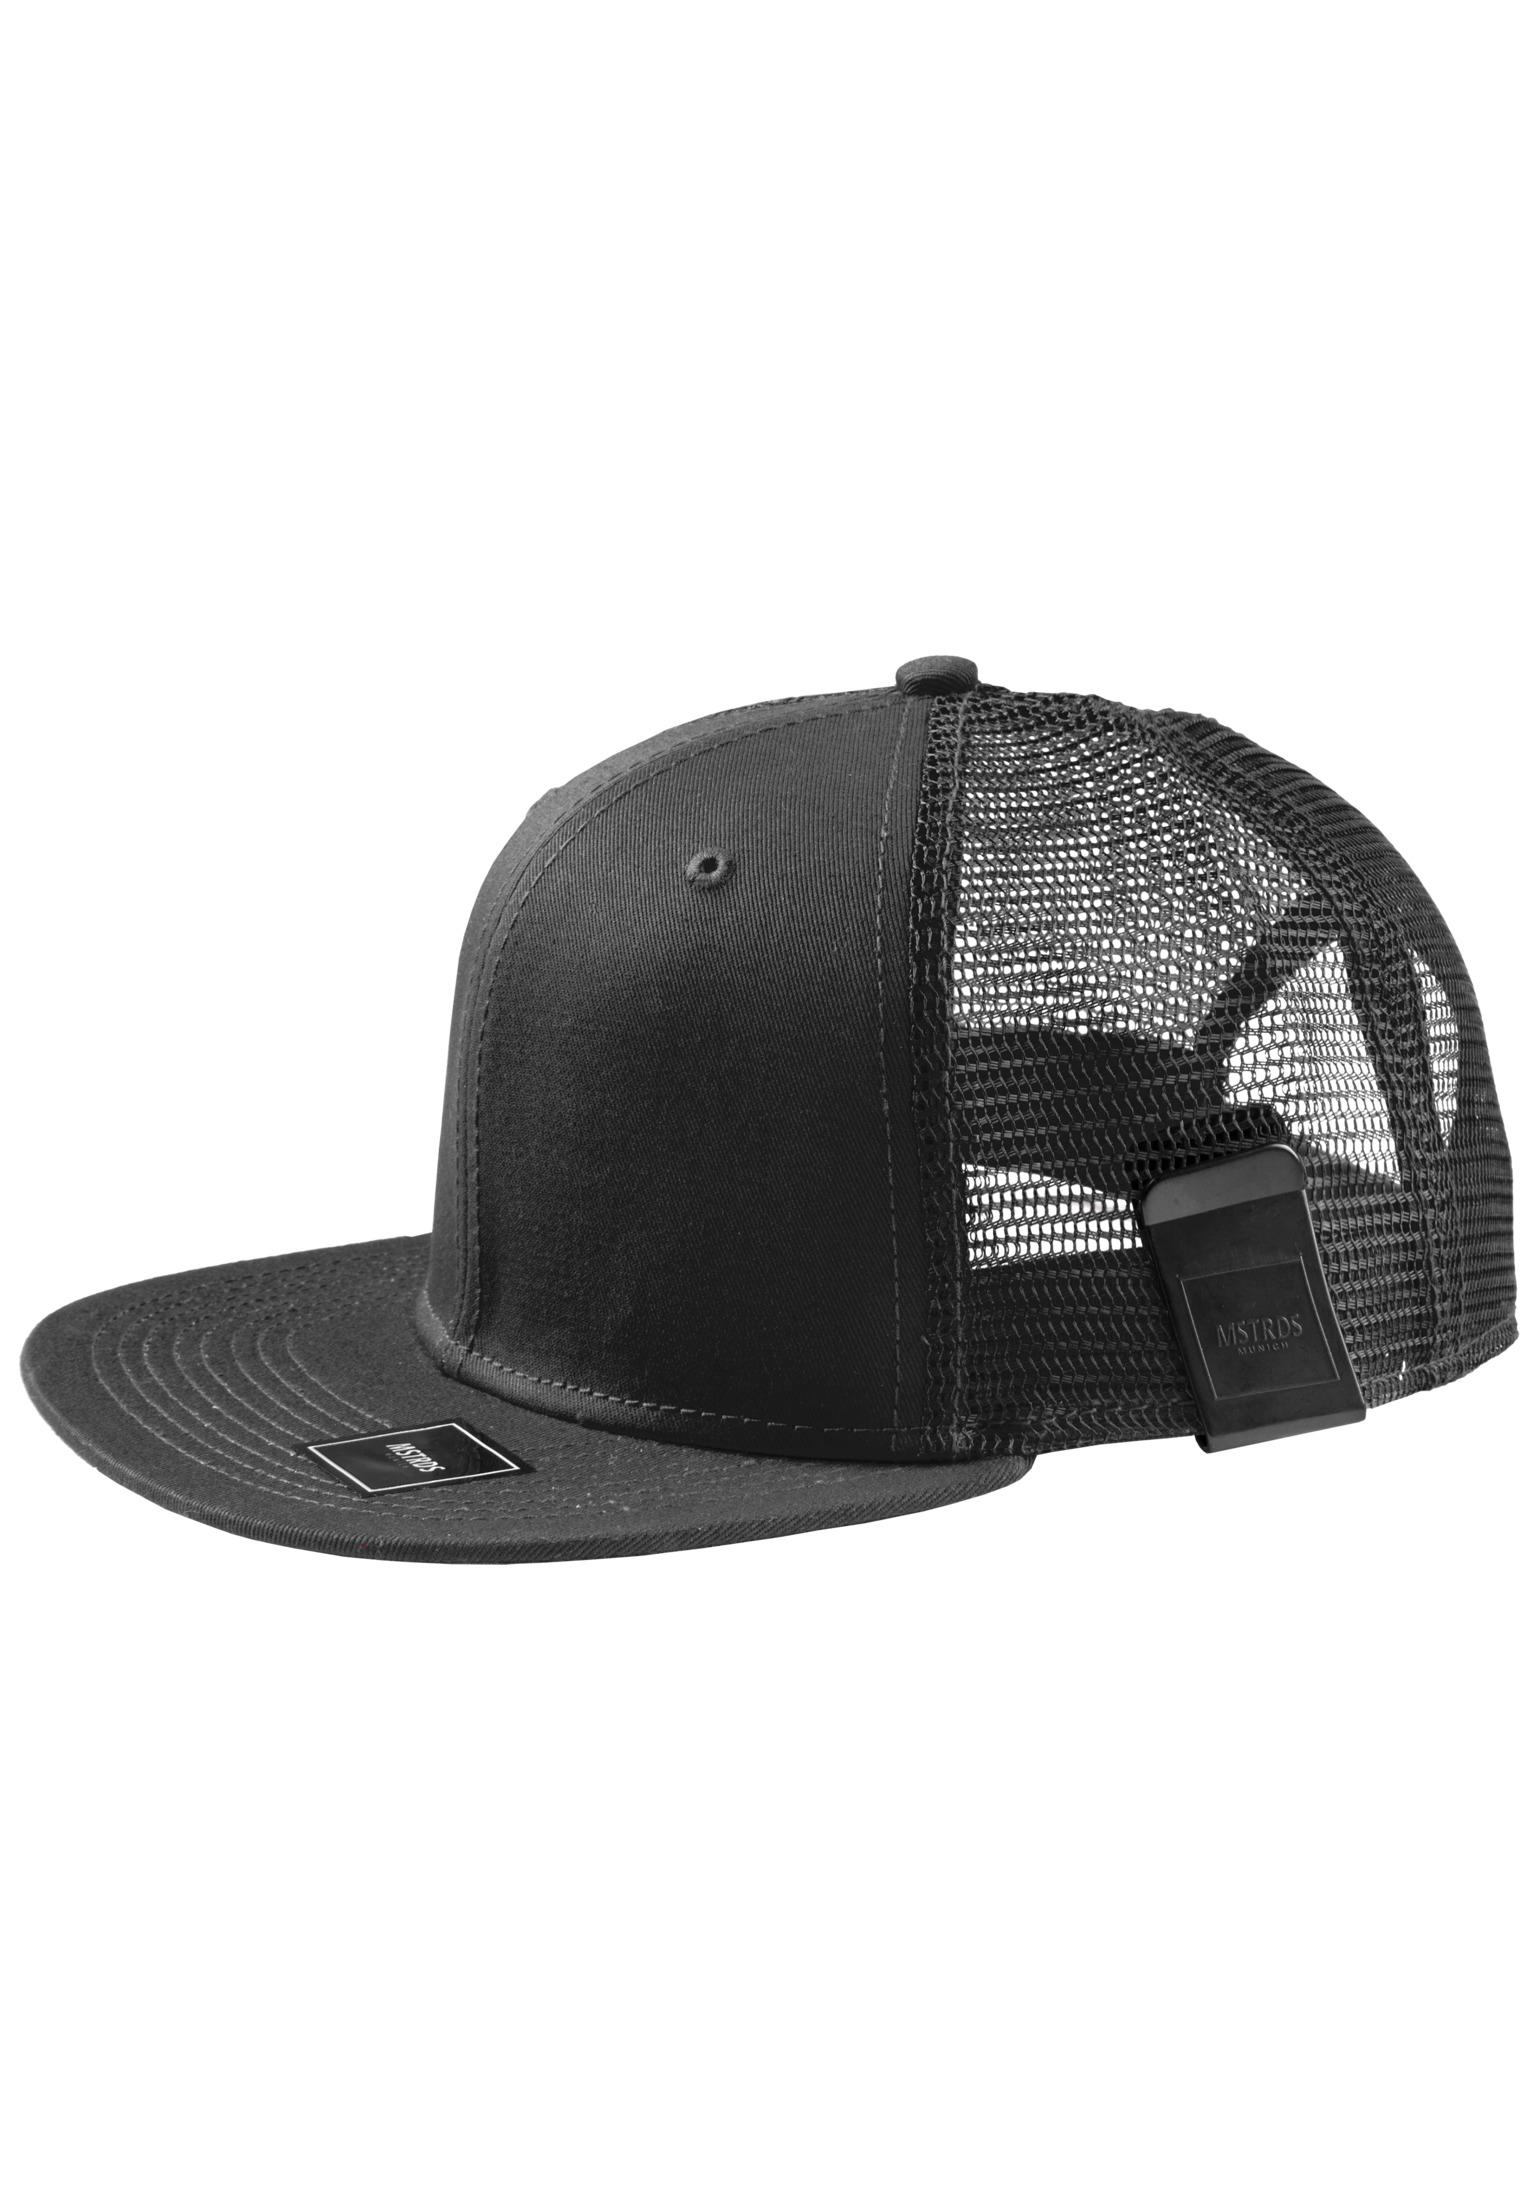 Master Dis MoneyClip Trucker Snapback Cap black - One Size